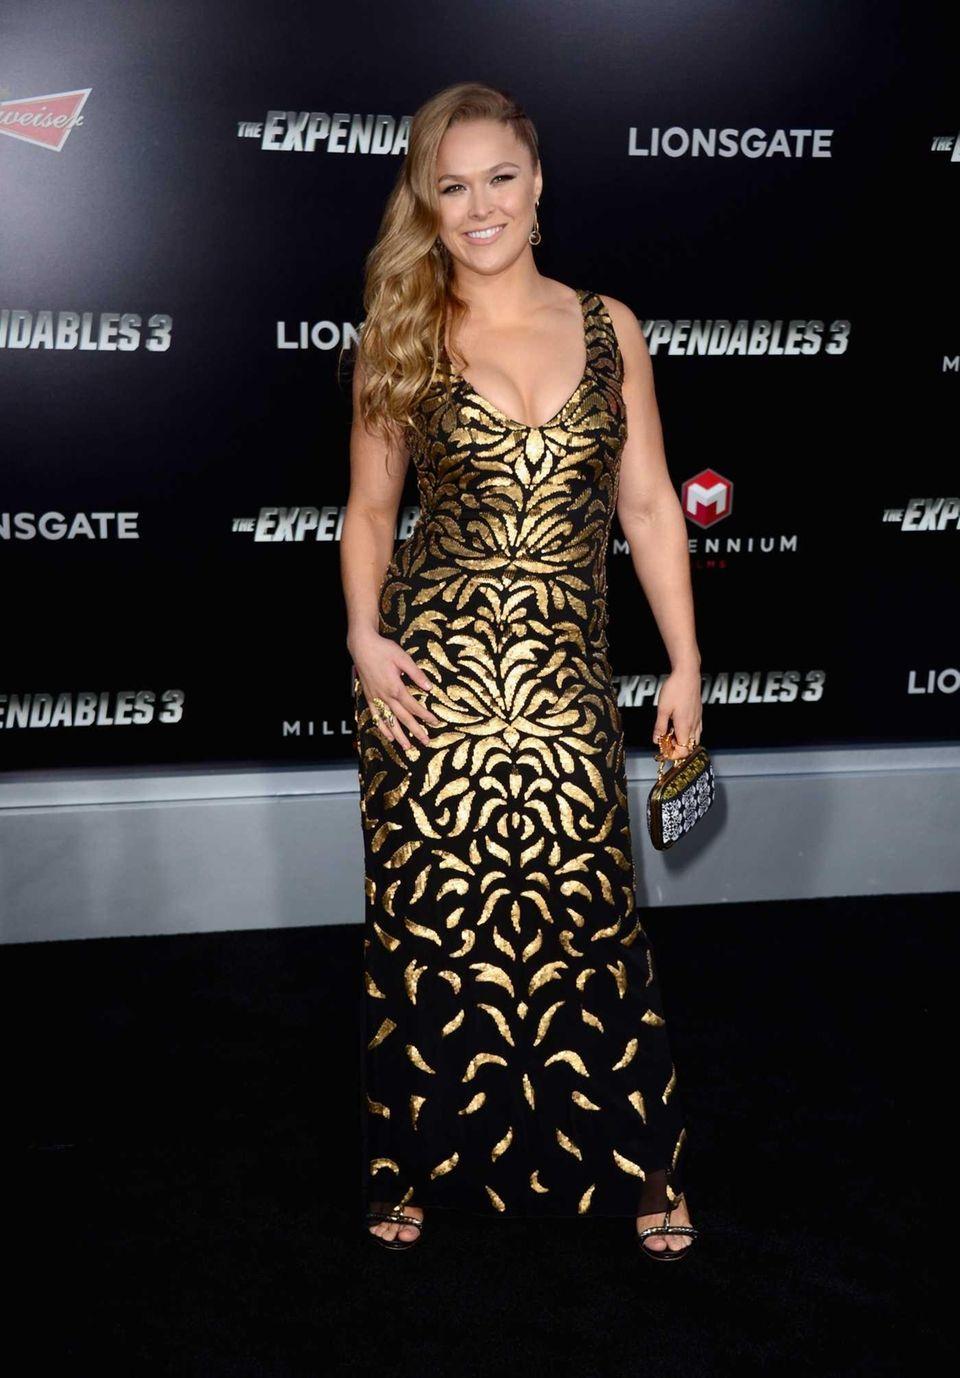 UFC women's bantamweight champion Ronda Rousey arrives at